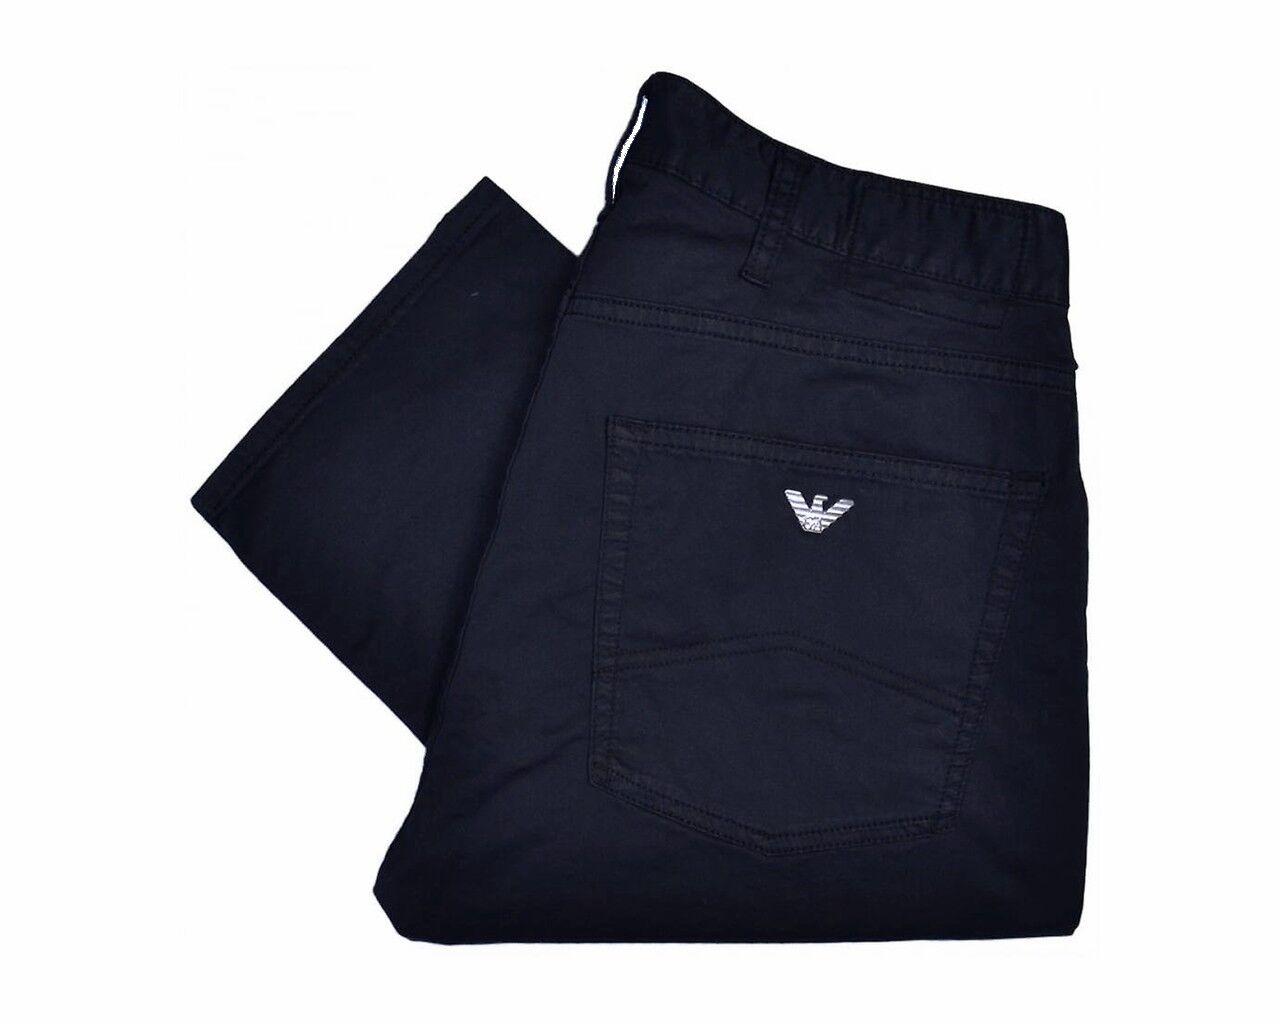 Armani Jeans 3Y6J45 6NEDZ Slim Fit J45 Mens Jeans Dark bluee